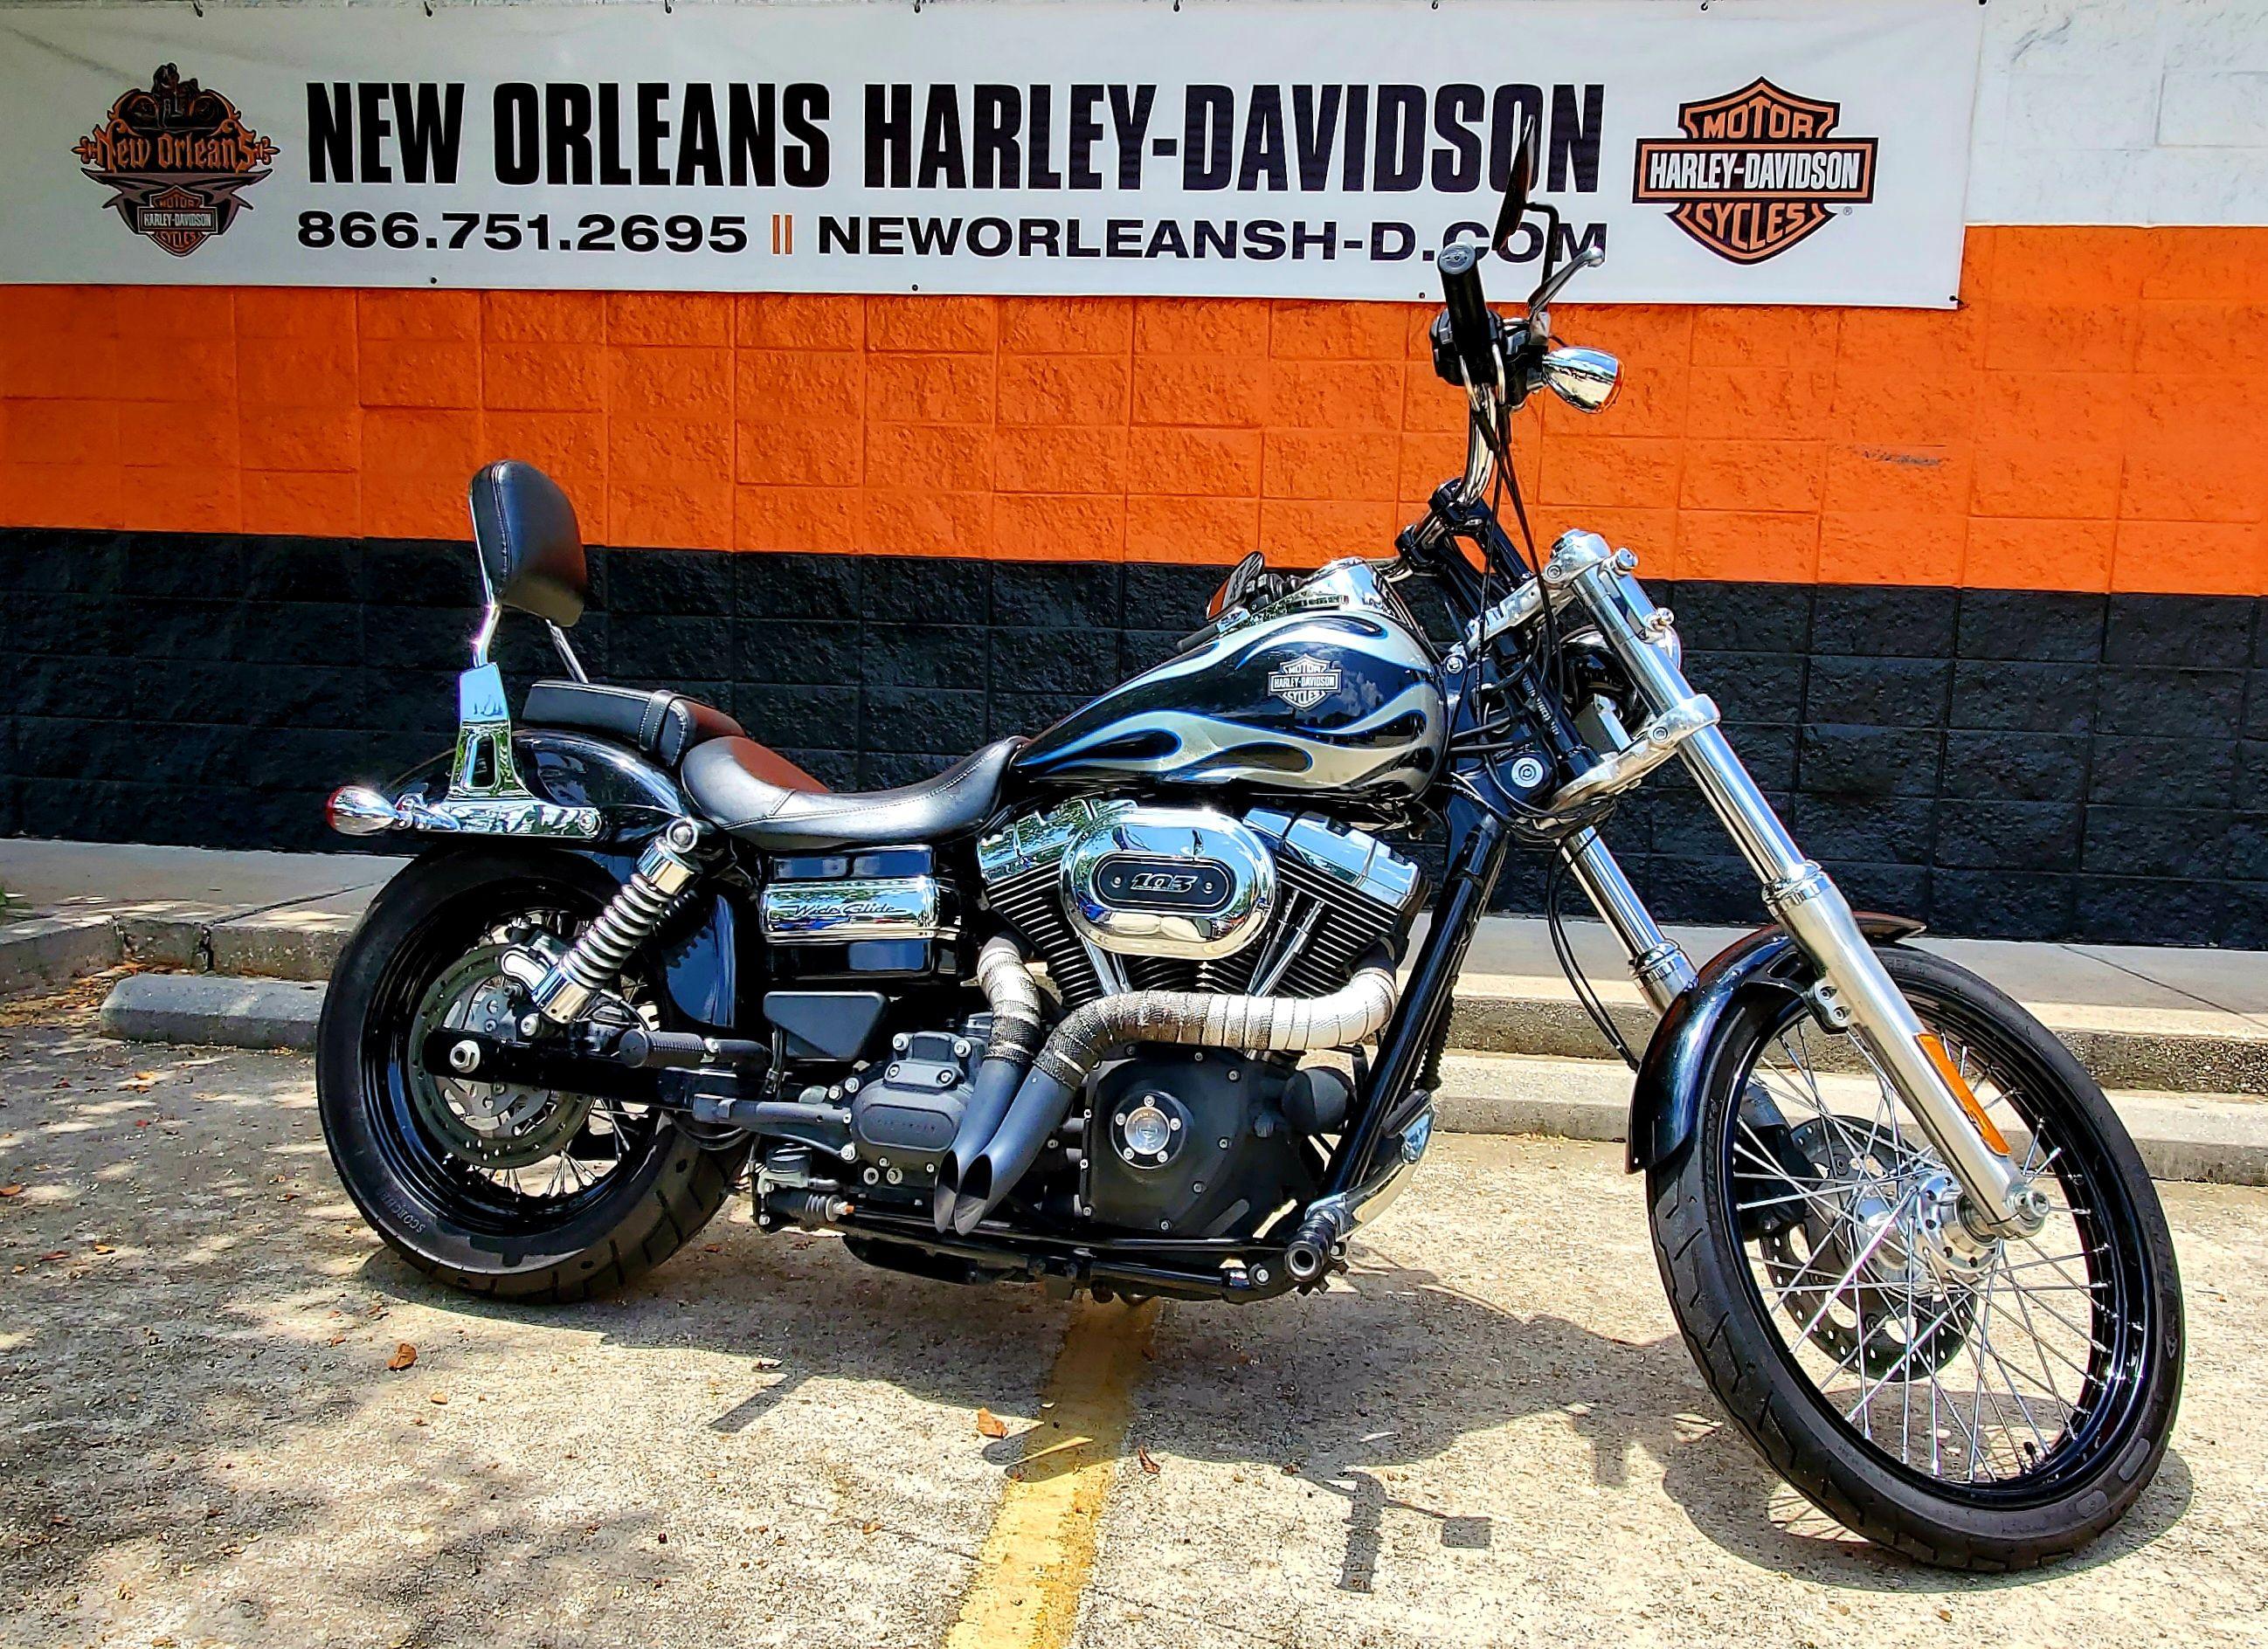 Pre-Owned 2016 Harley-Davidson Wide Glide FXDWG